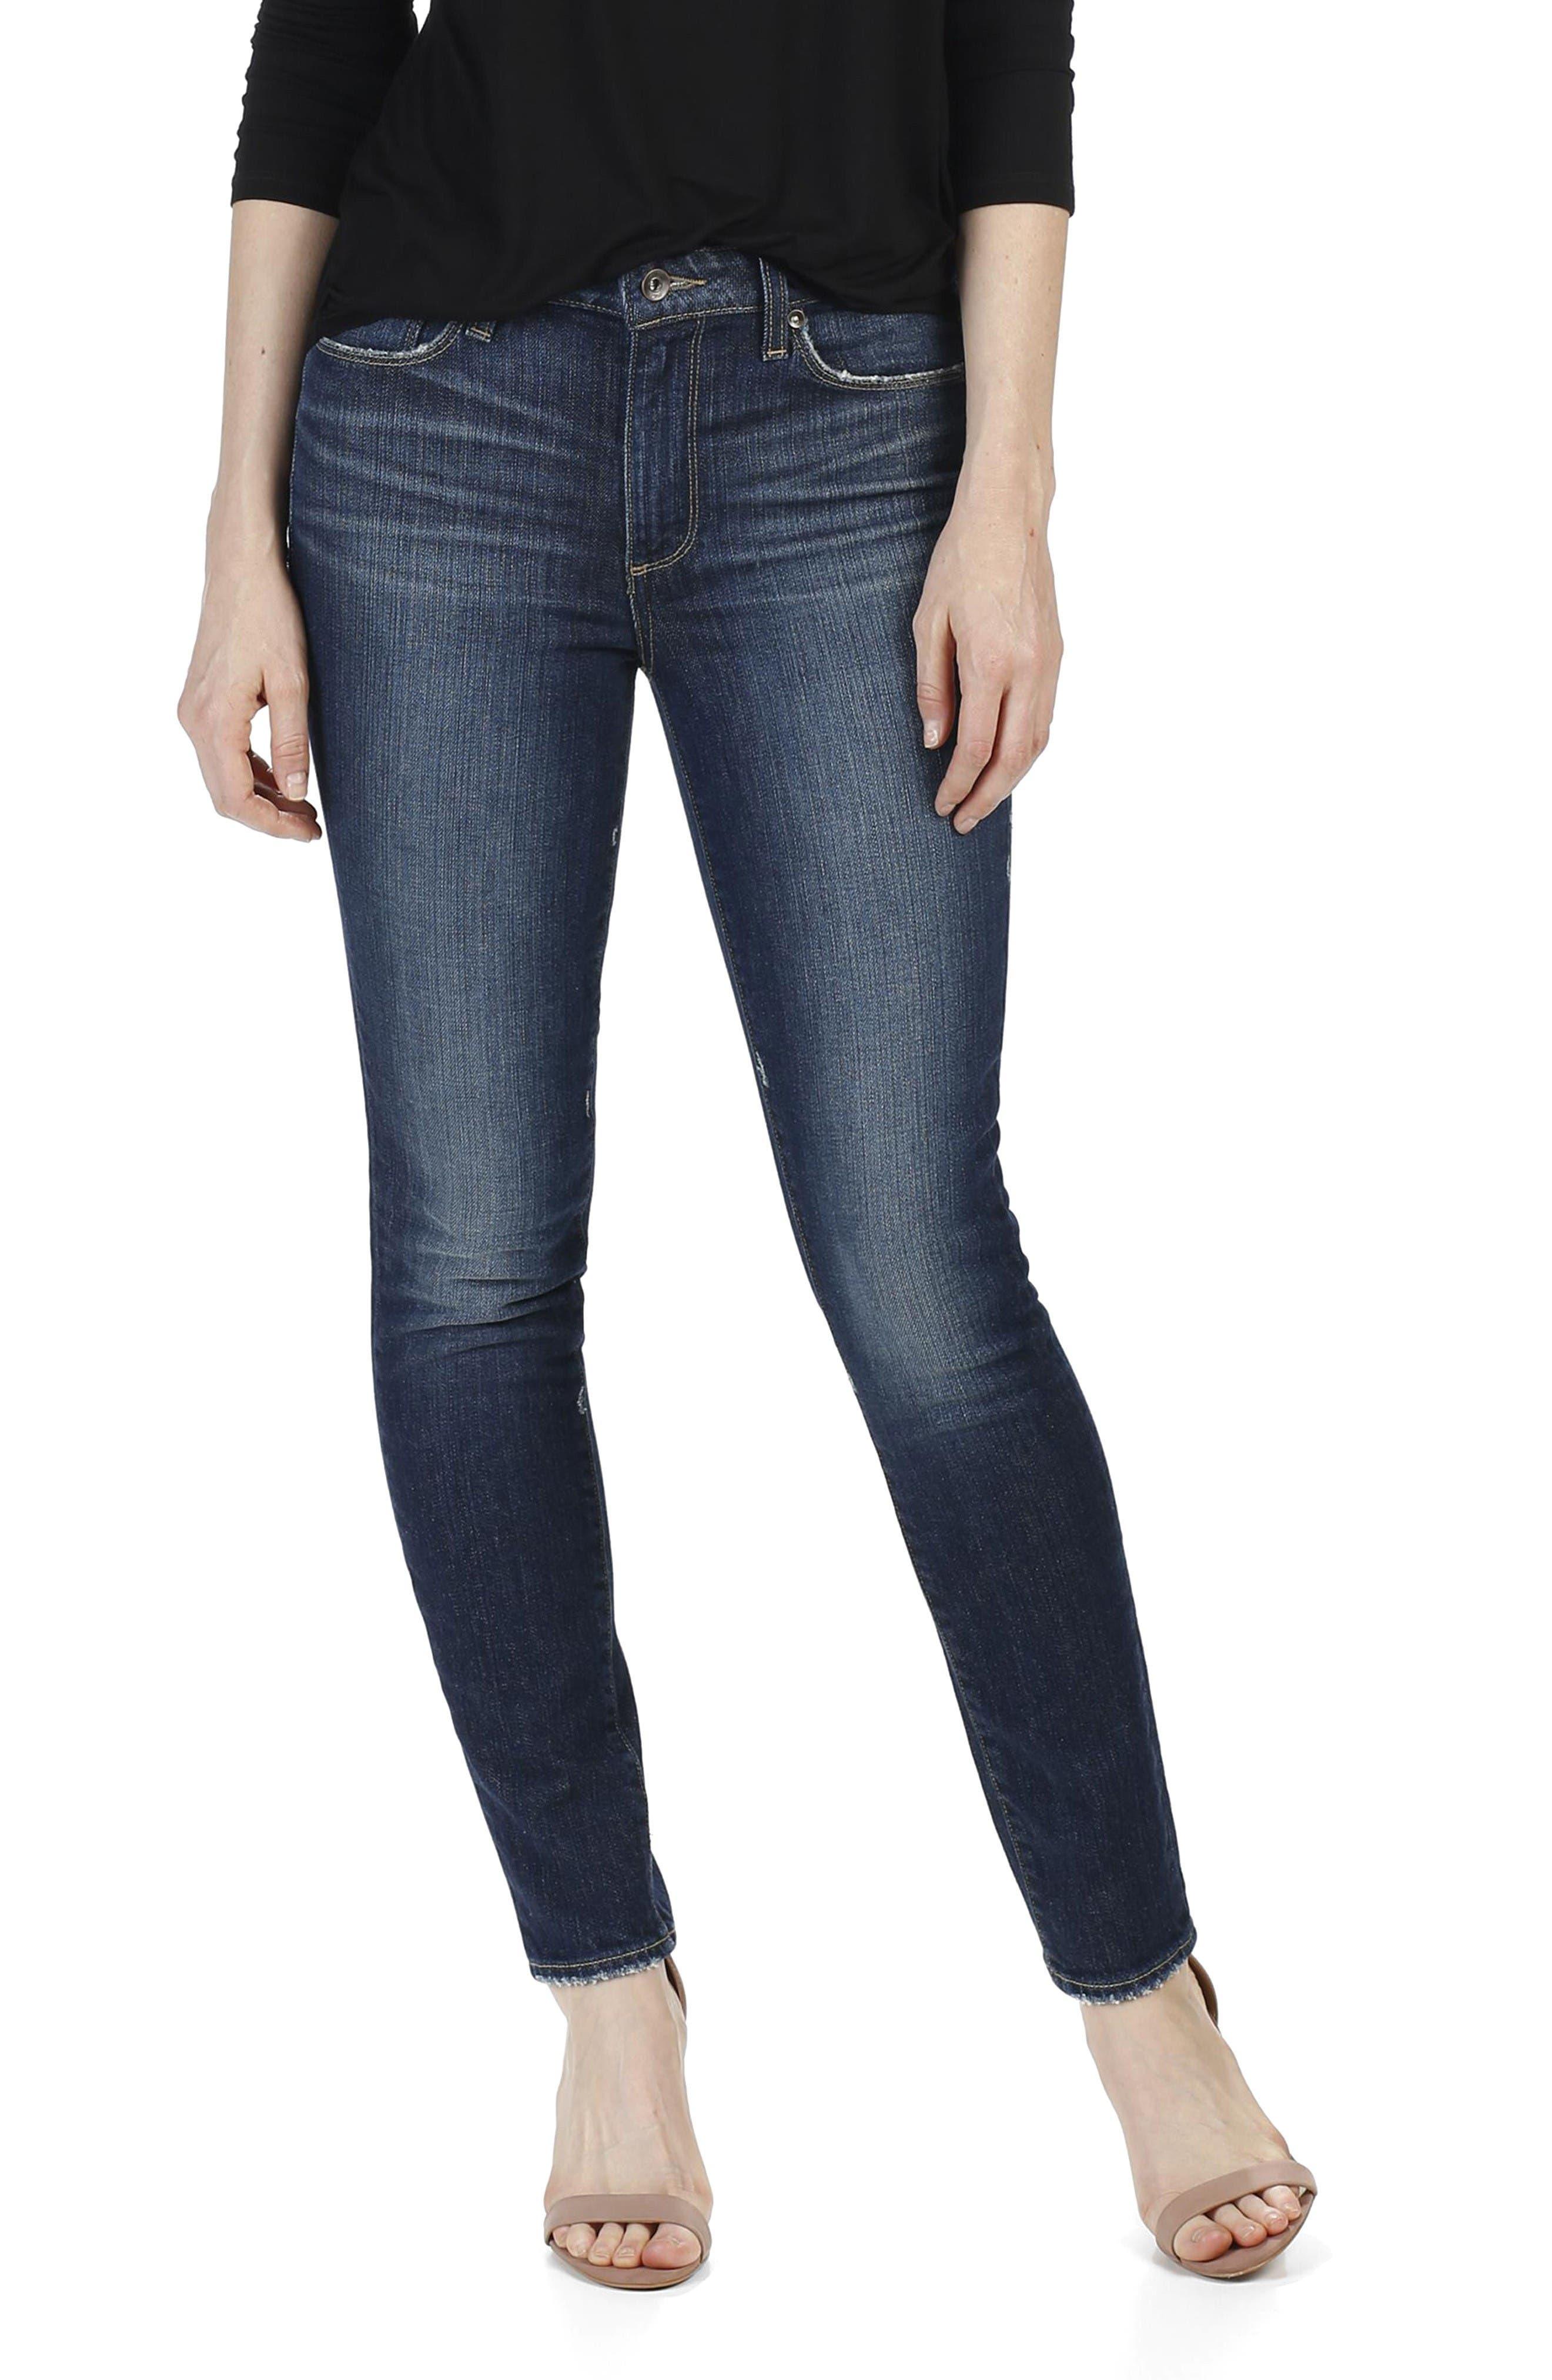 PAIGE Hoxton High Waist Ultra Skinny Jeans